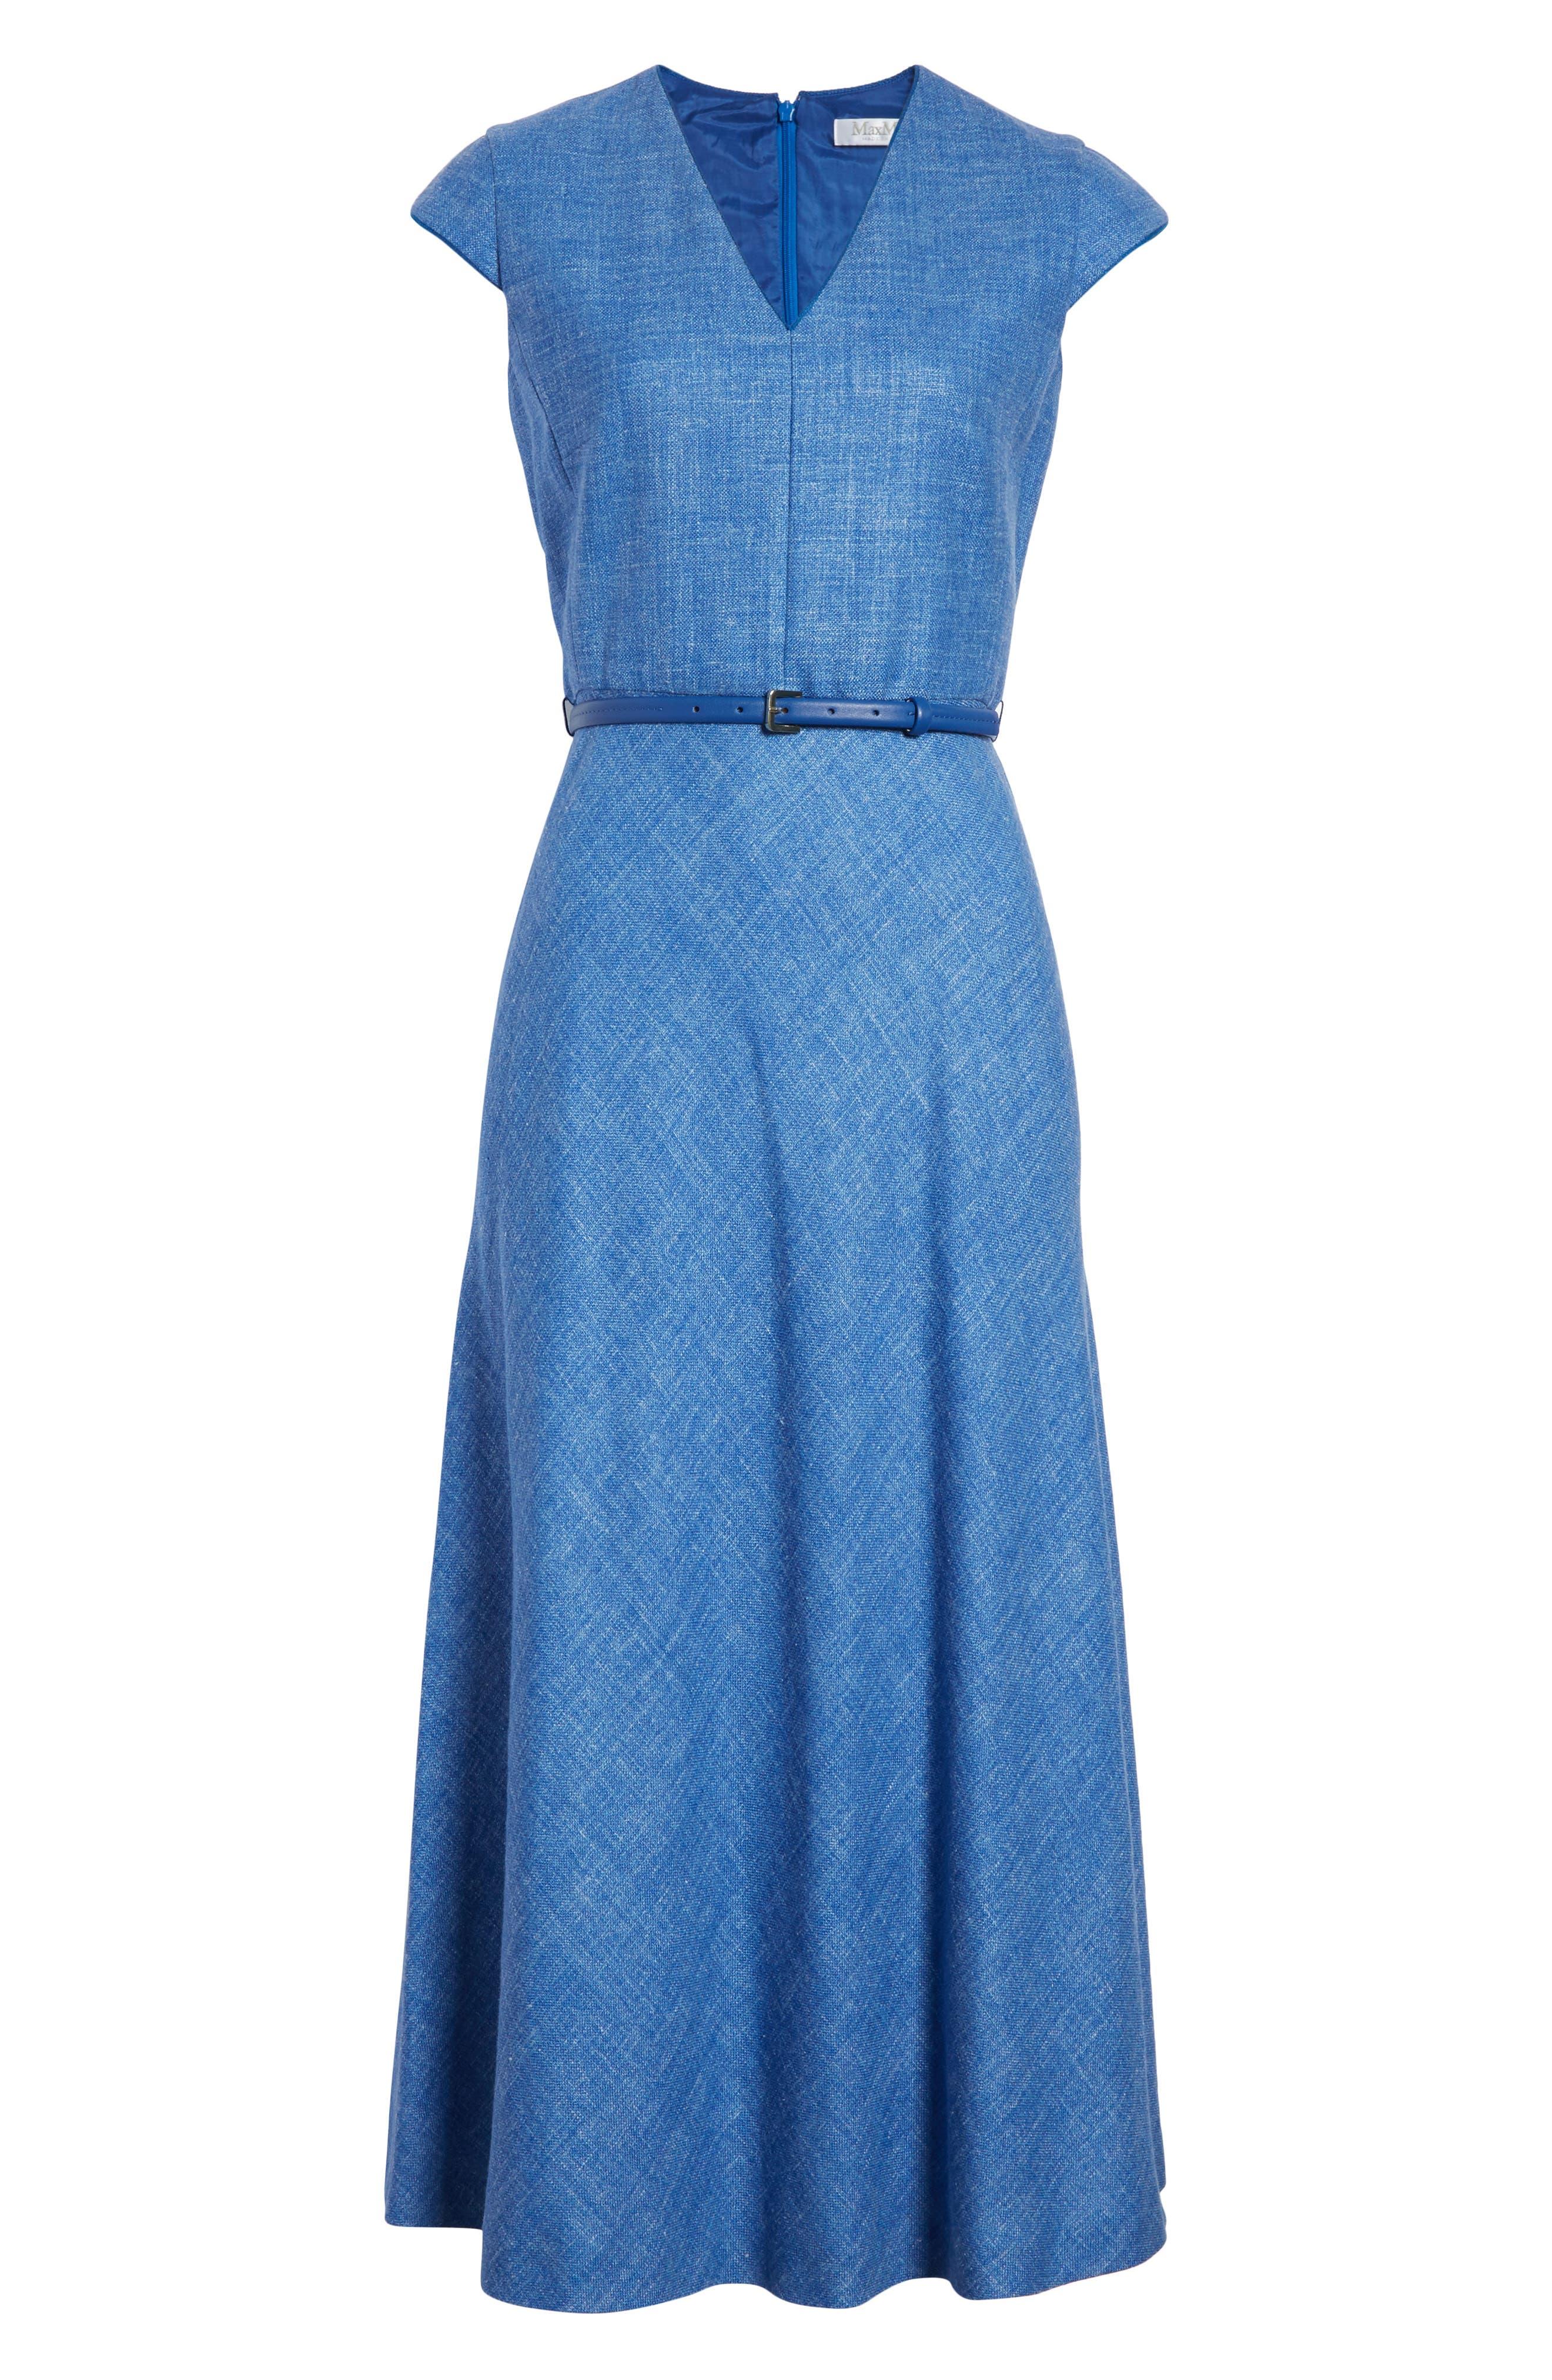 Caramba Silk, Linen & Wool Midi Dress,                             Alternate thumbnail 6, color,                             404